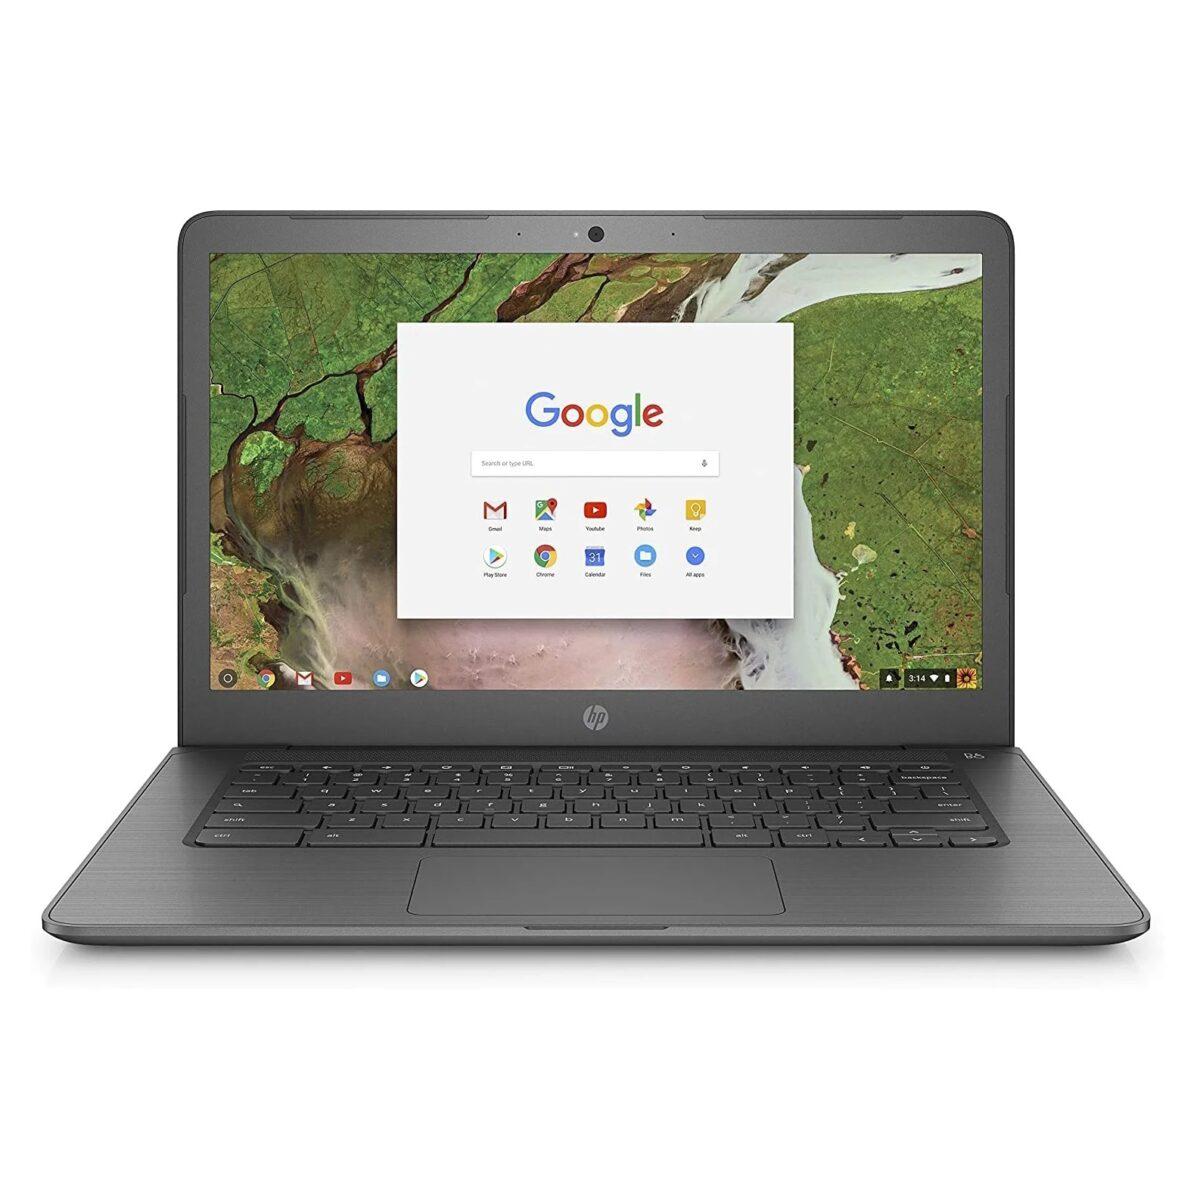 "HP Laptop Chromebook G5 Powerful 14"" 16GB 4GB Webcam HDMI Refurbished Black"